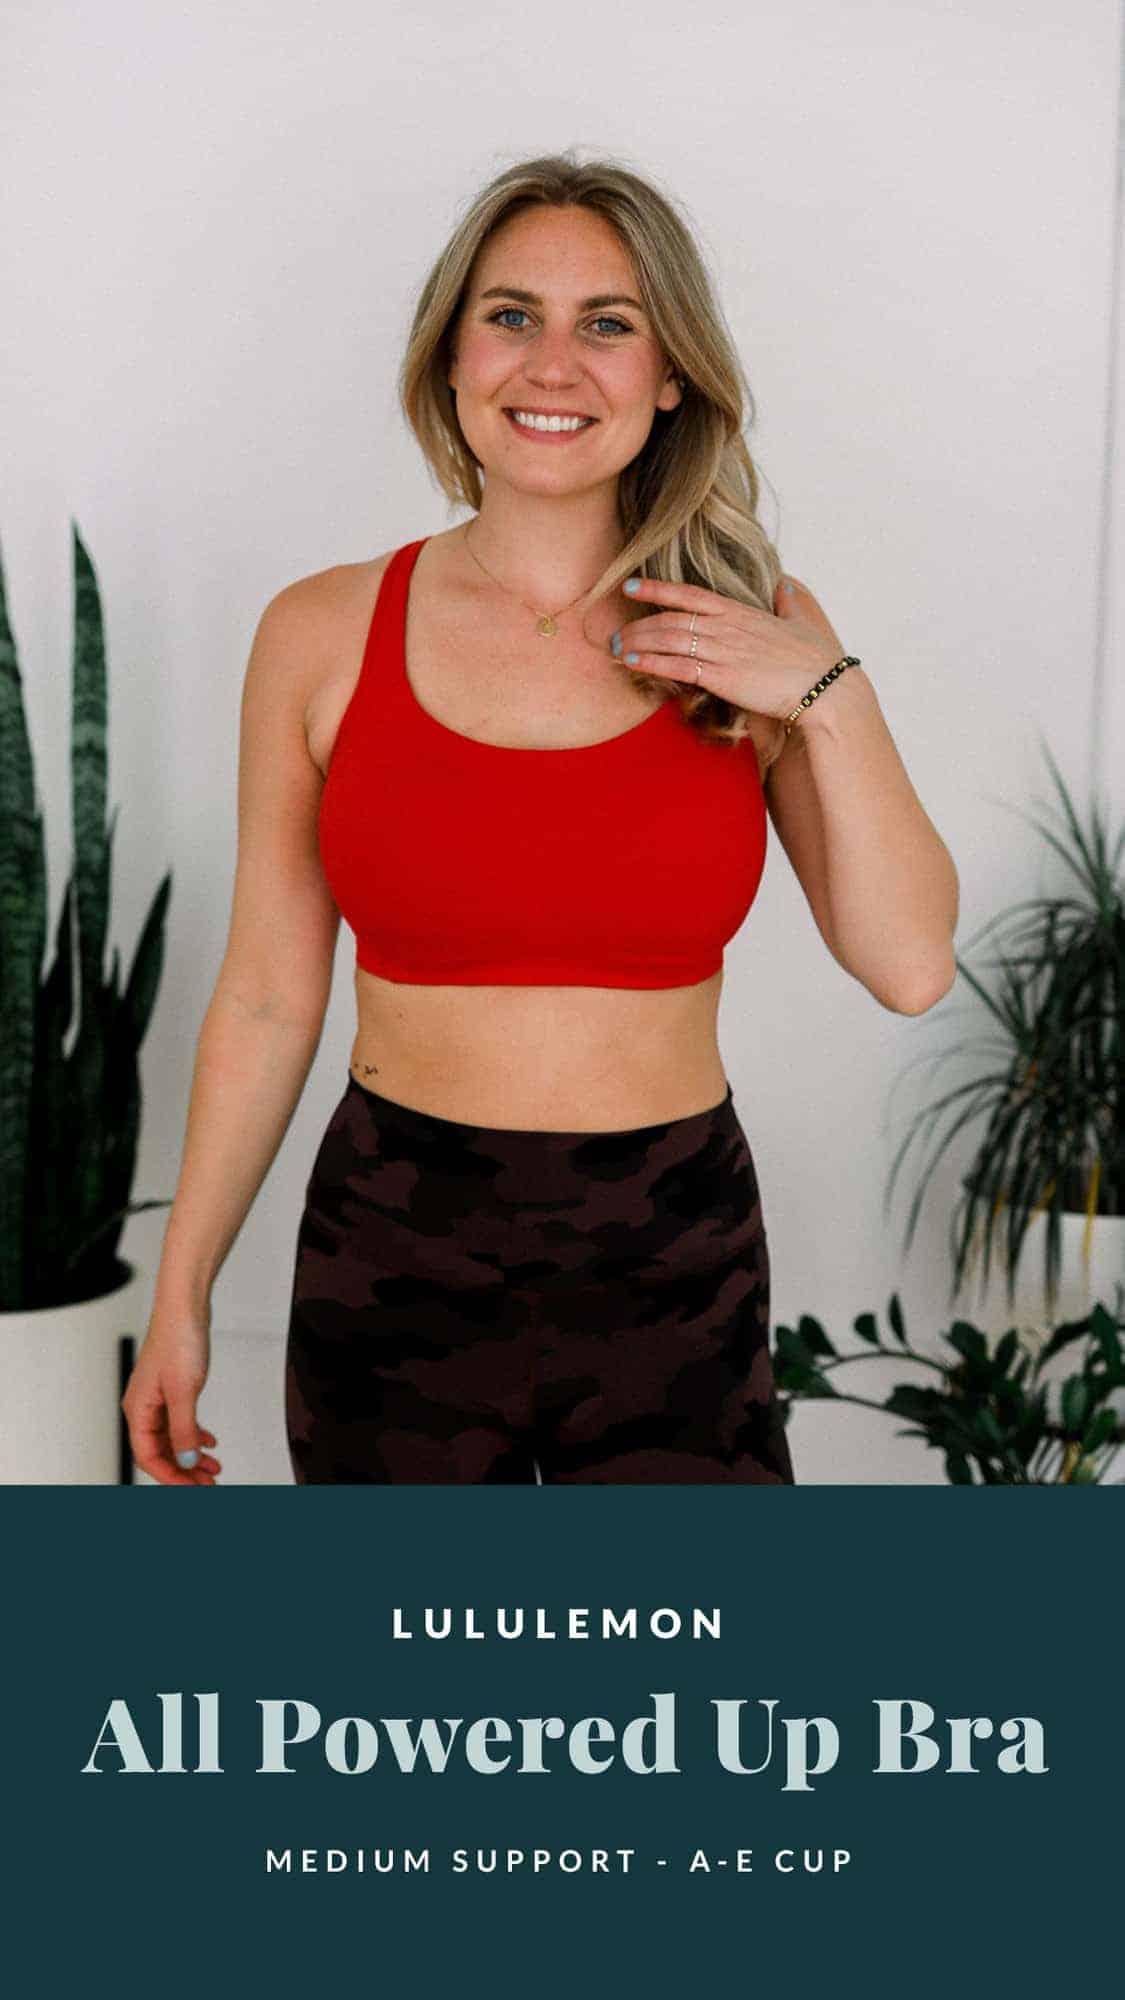 woman wearing red sports bra and bracelet